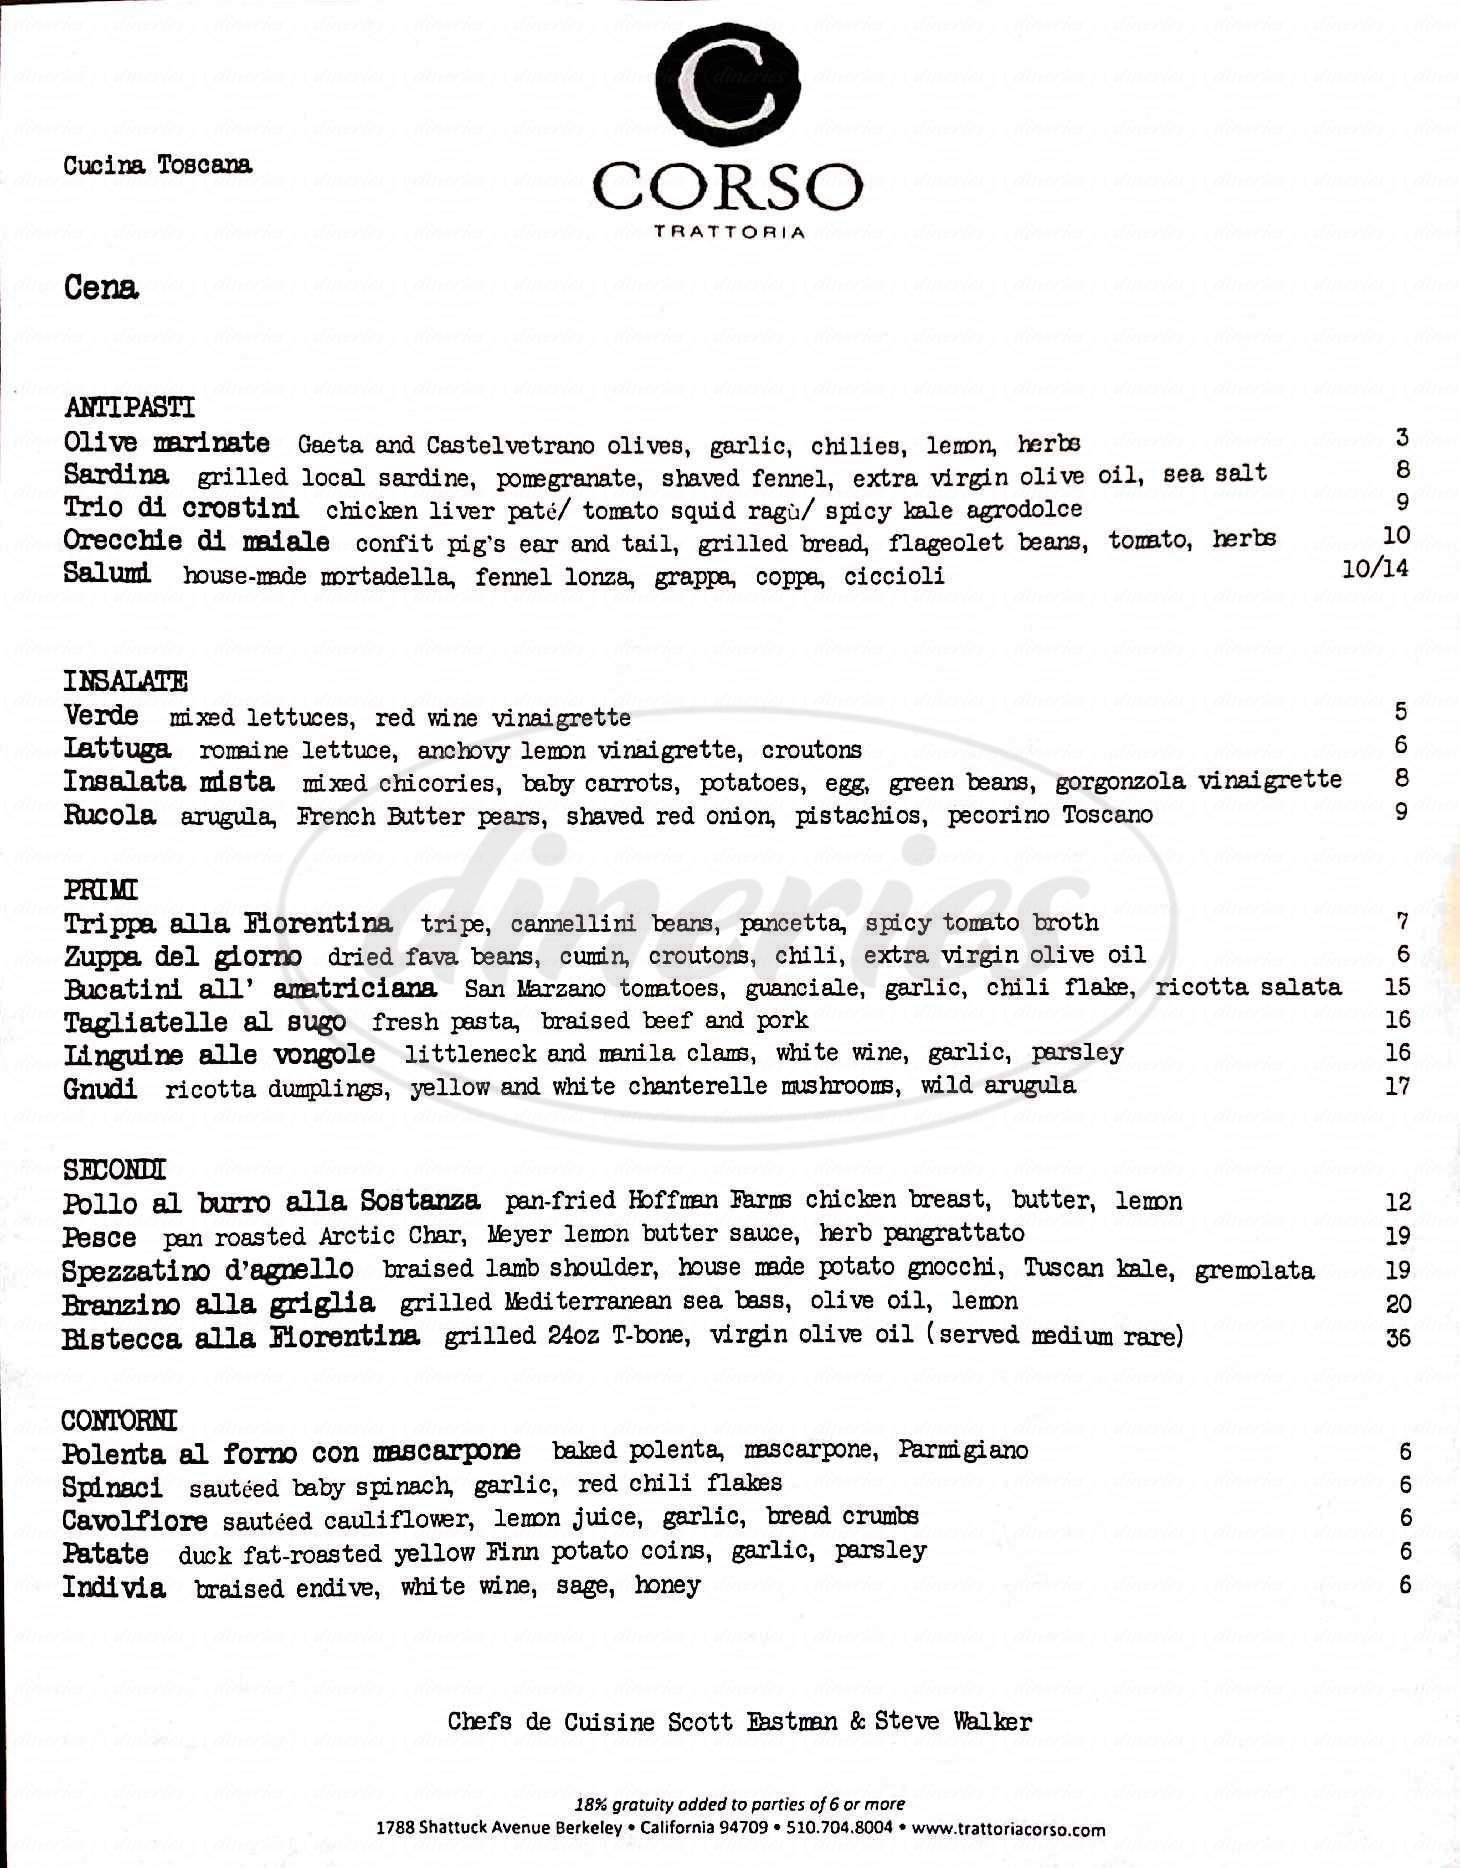 menu for Corso Trattoria